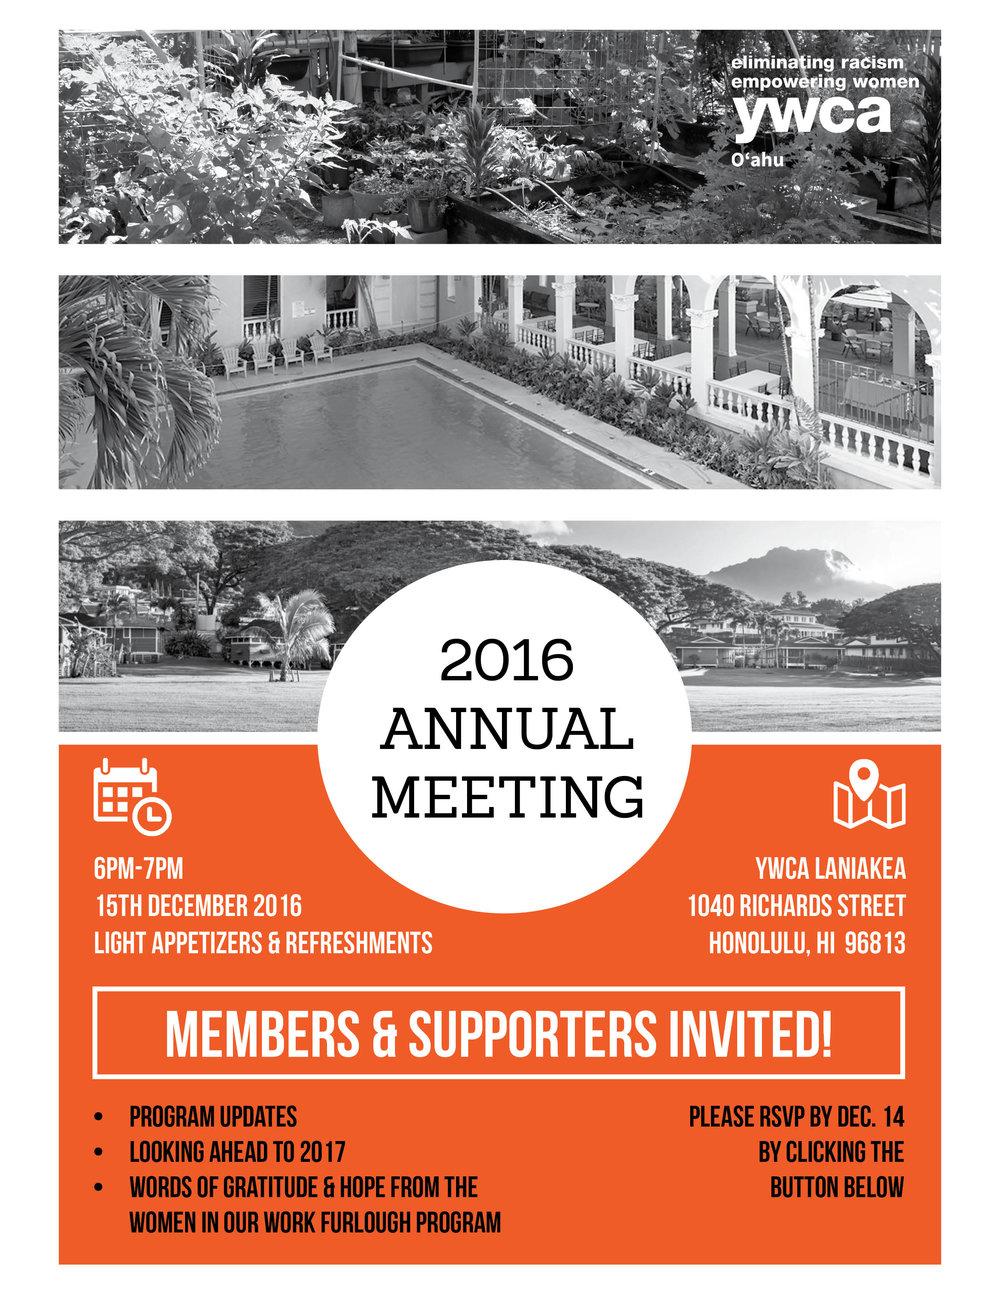 2016 Annual Meeting flyer.jpg